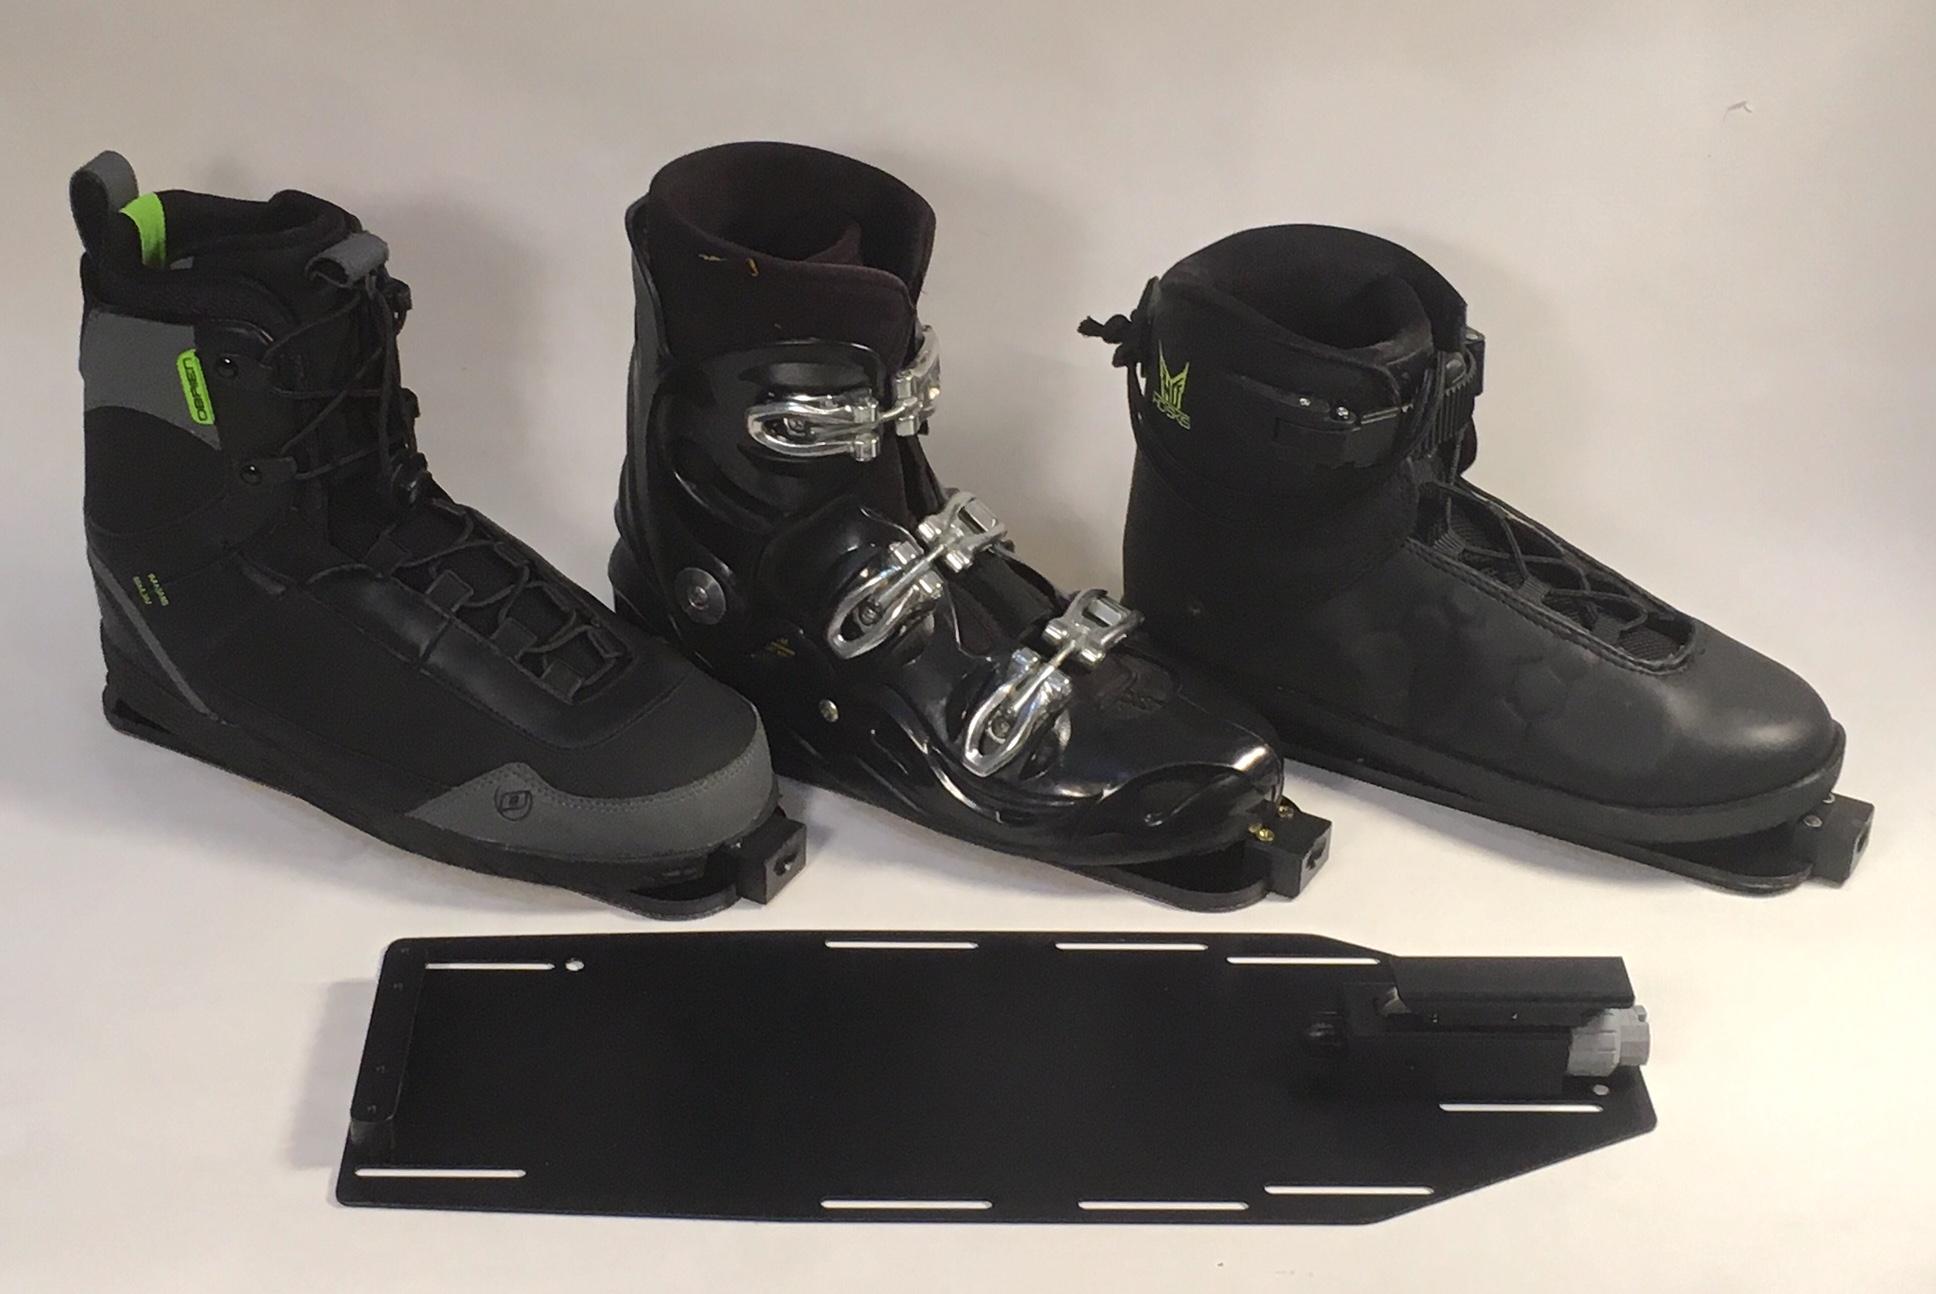 Three boot styles on MOB